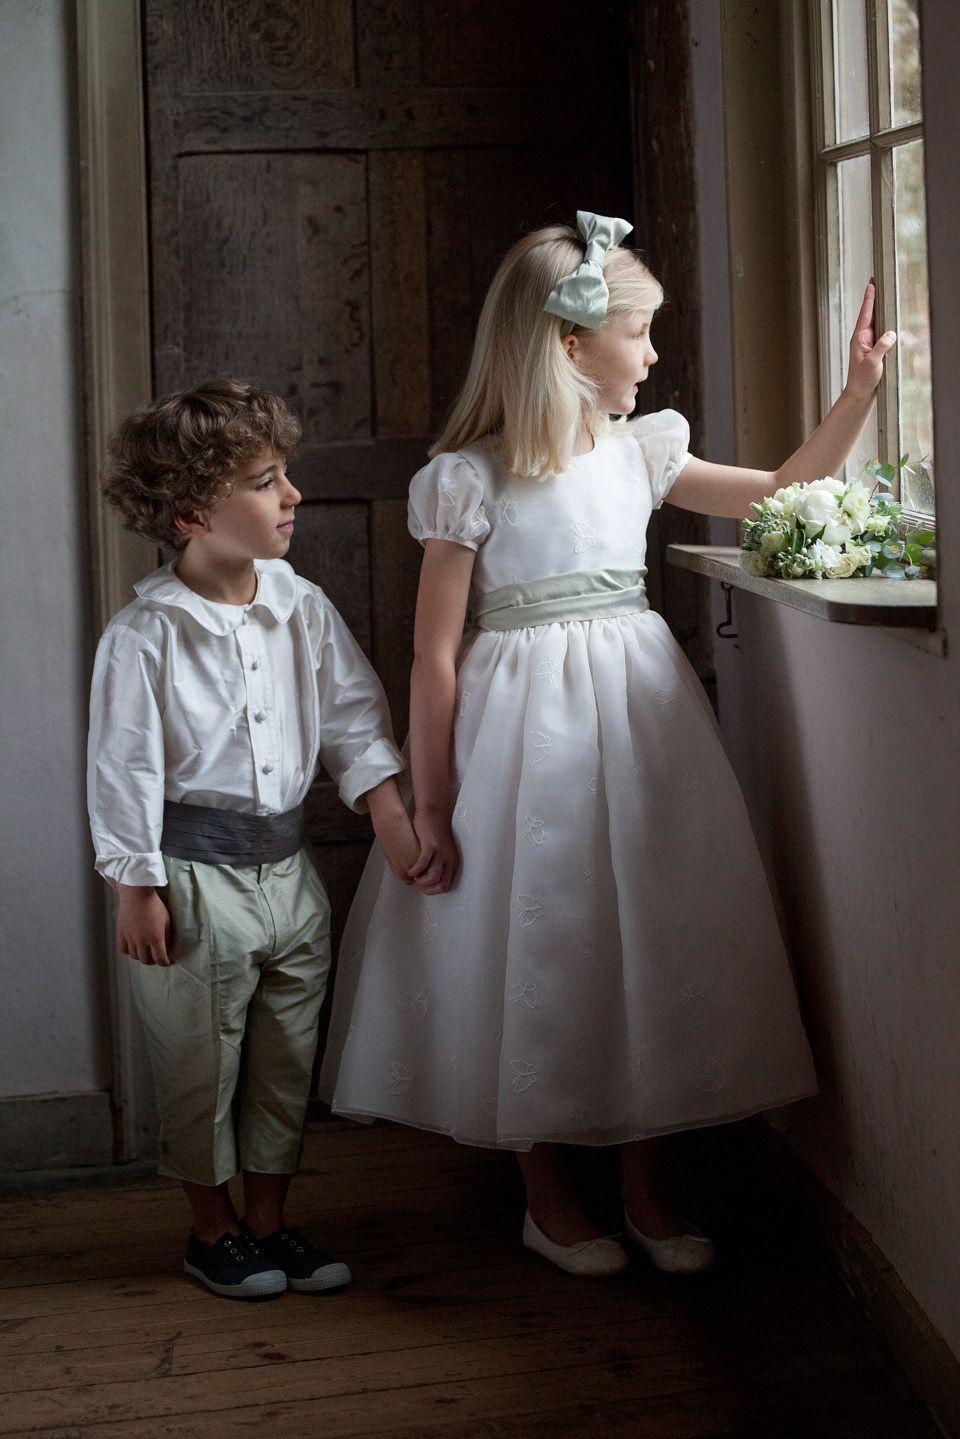 An interview with nicki macfarlane kids bridesmaid dress